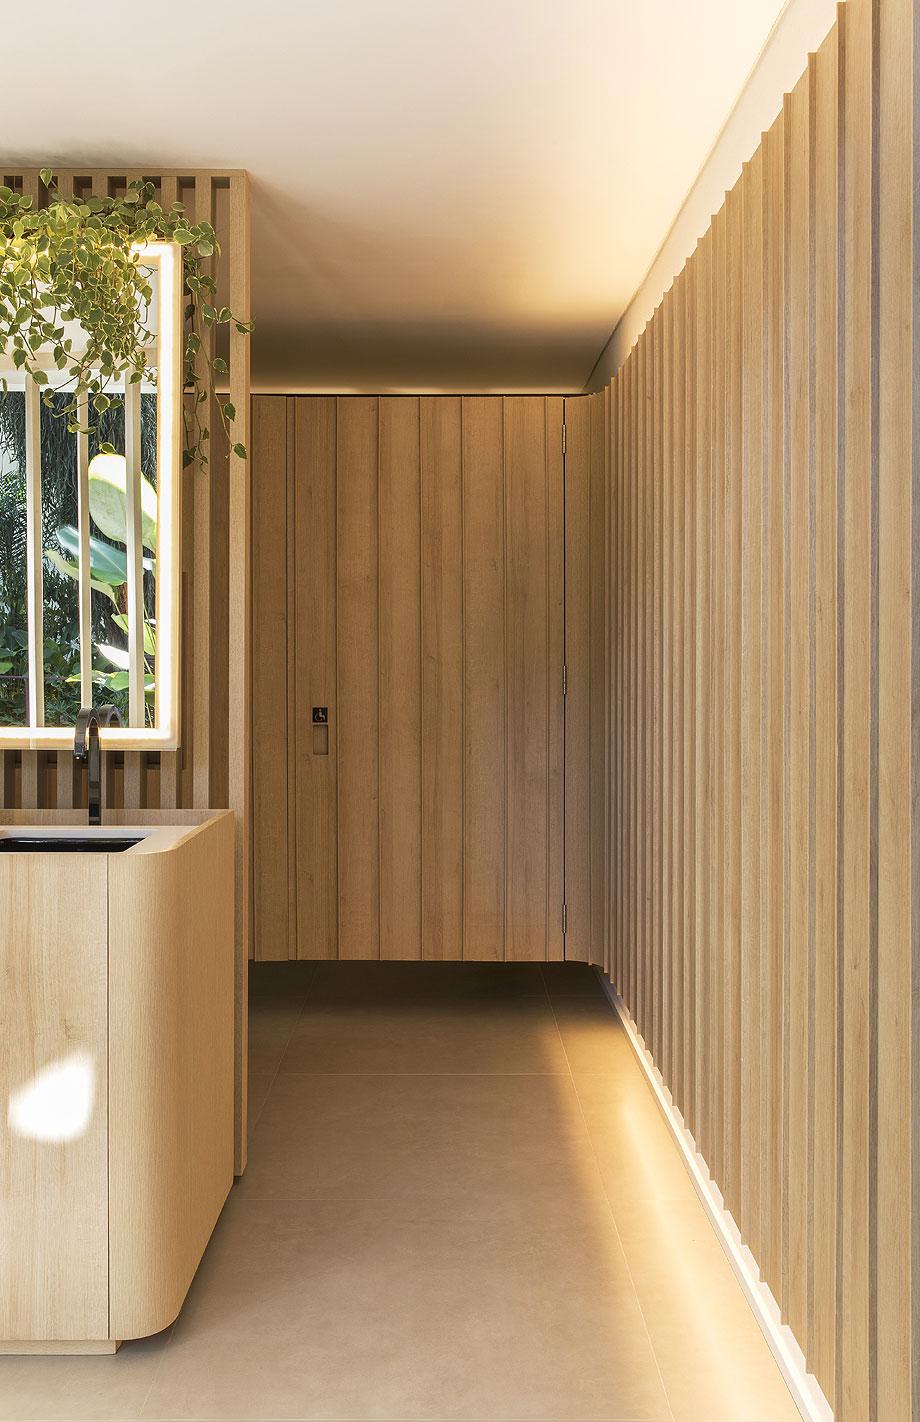 recinto do bosque de gdl arquitectura - foto felipe araujo (7)